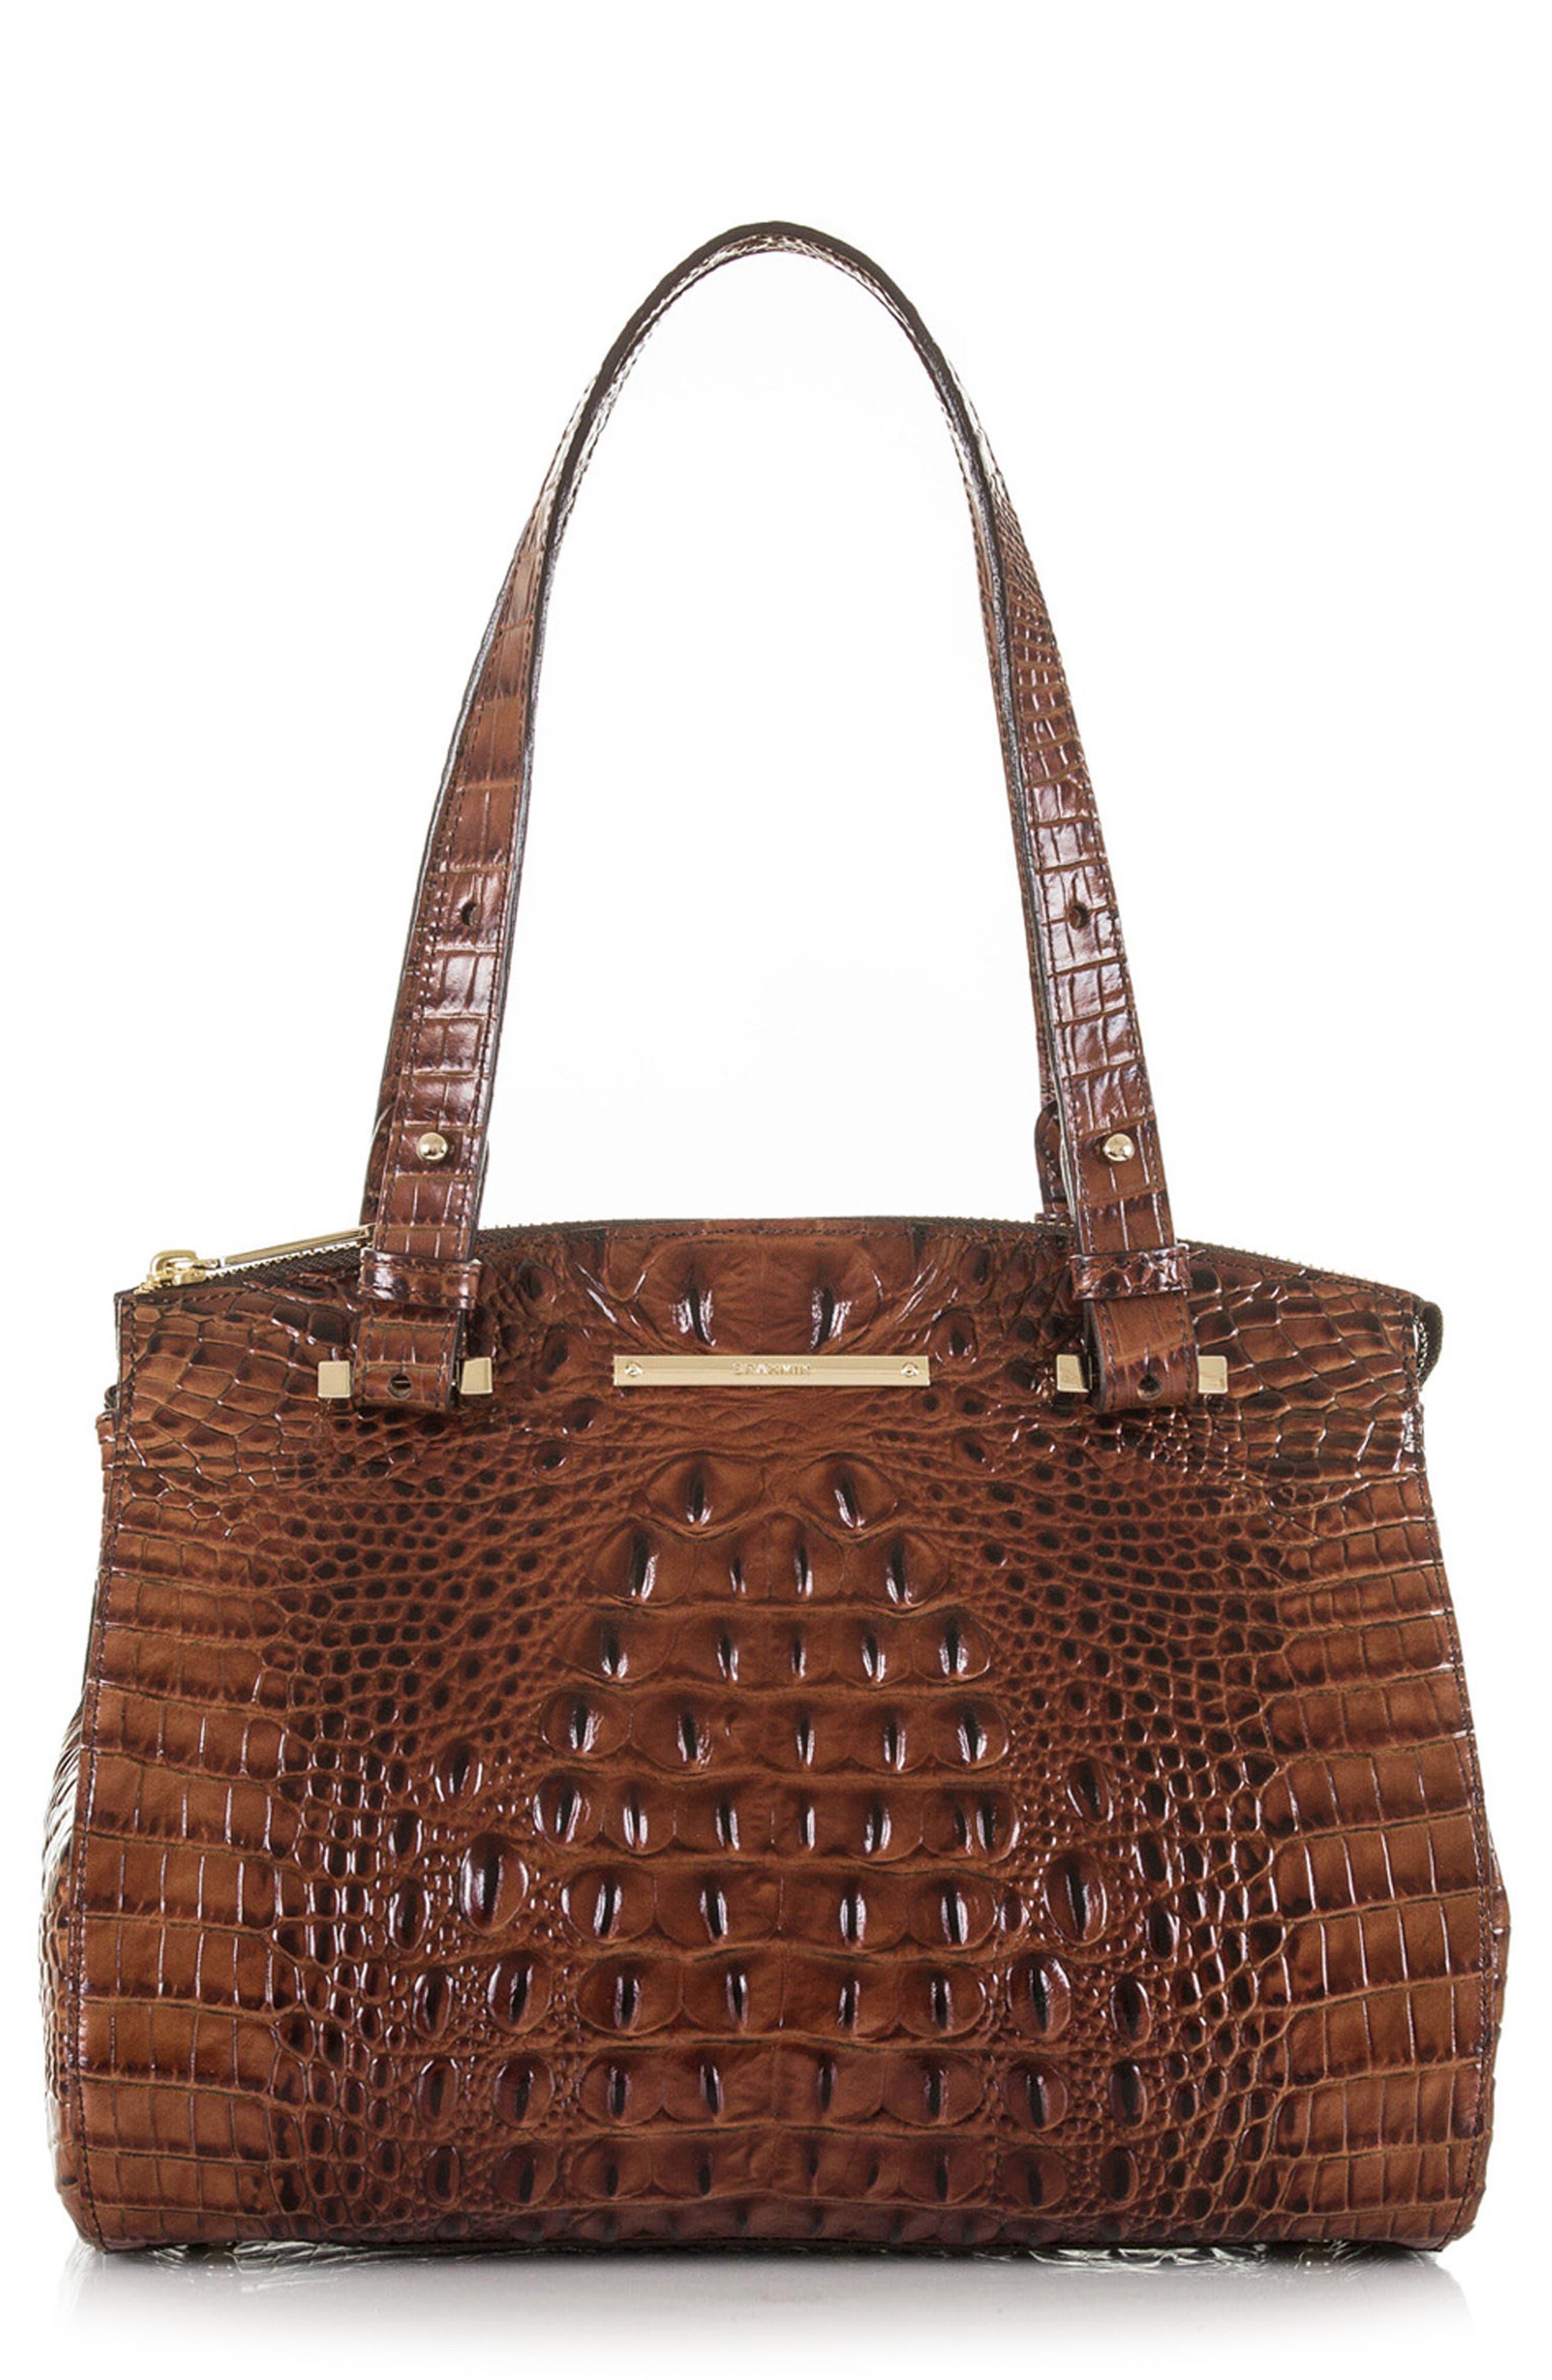 Main Image - Brahmin Small Alice Melbourne Leather Satchel